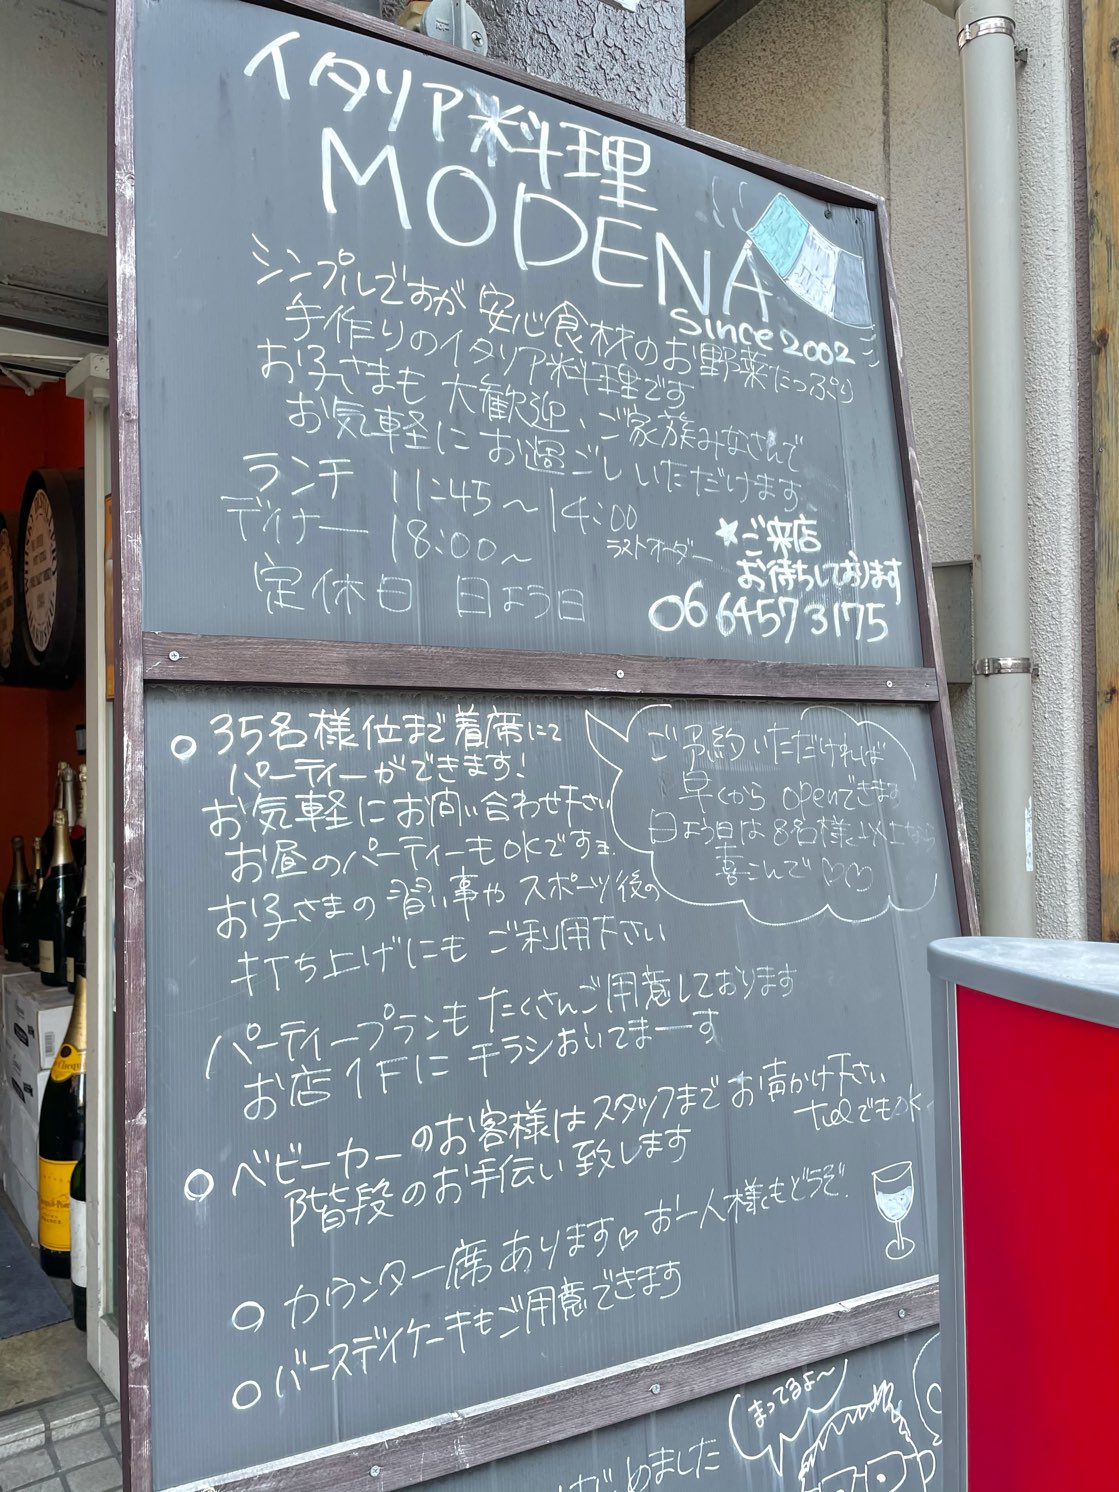 A・CANTINETTA・MODENA (ラカンティネッタモデナ)